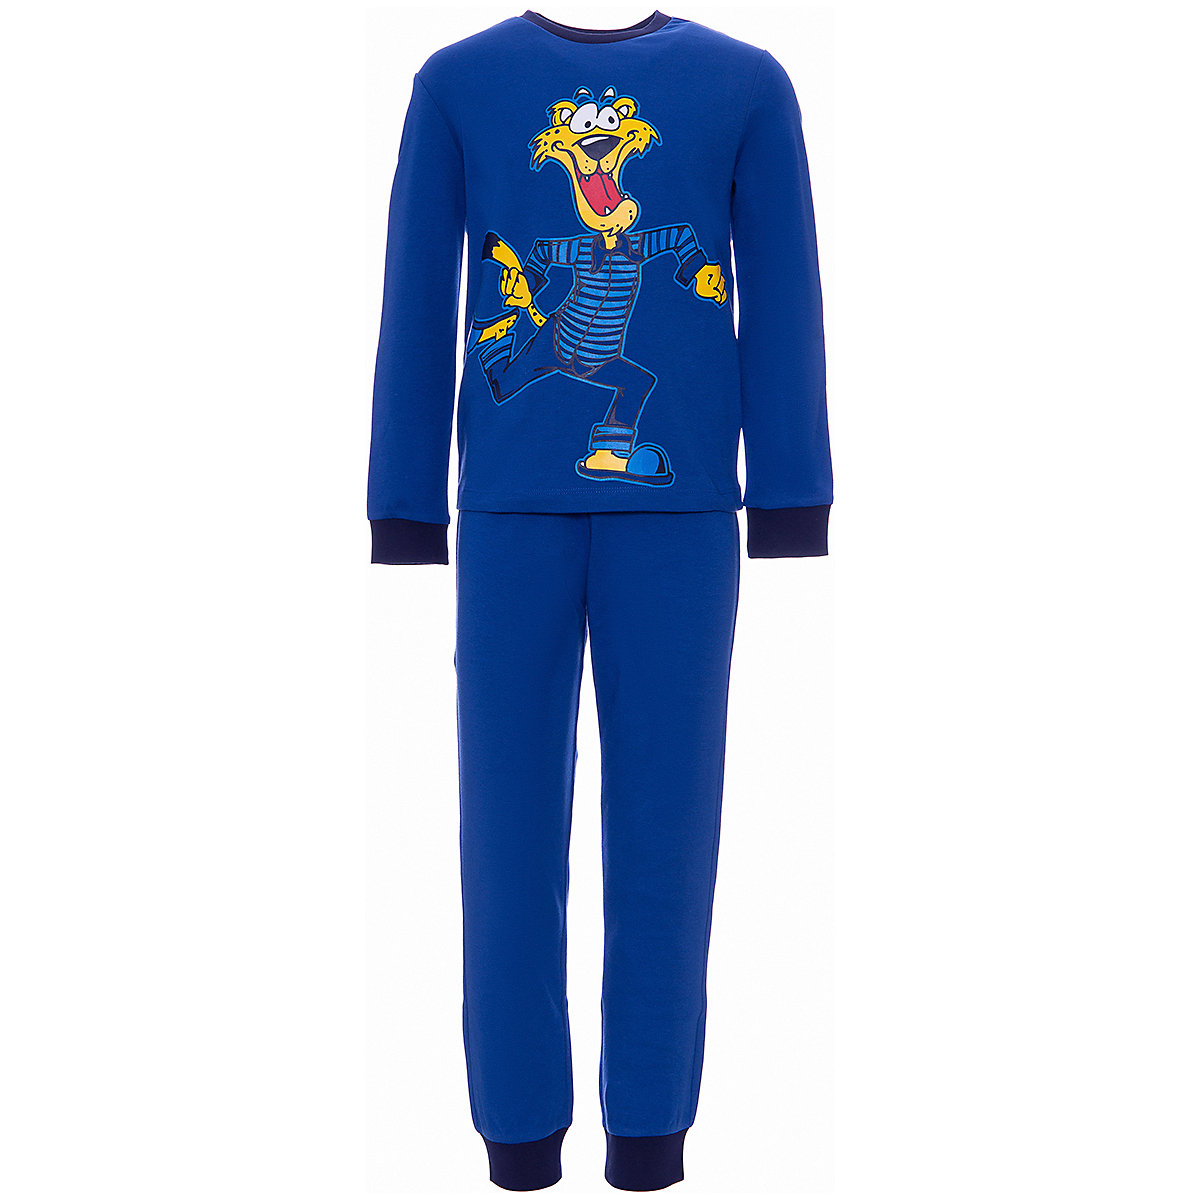 ORIGINAL MARINES Pajama Sets 9501034 Cotton Boys childrens clothing Sleepwear Robe leaf print ruffle hem cami pajama set